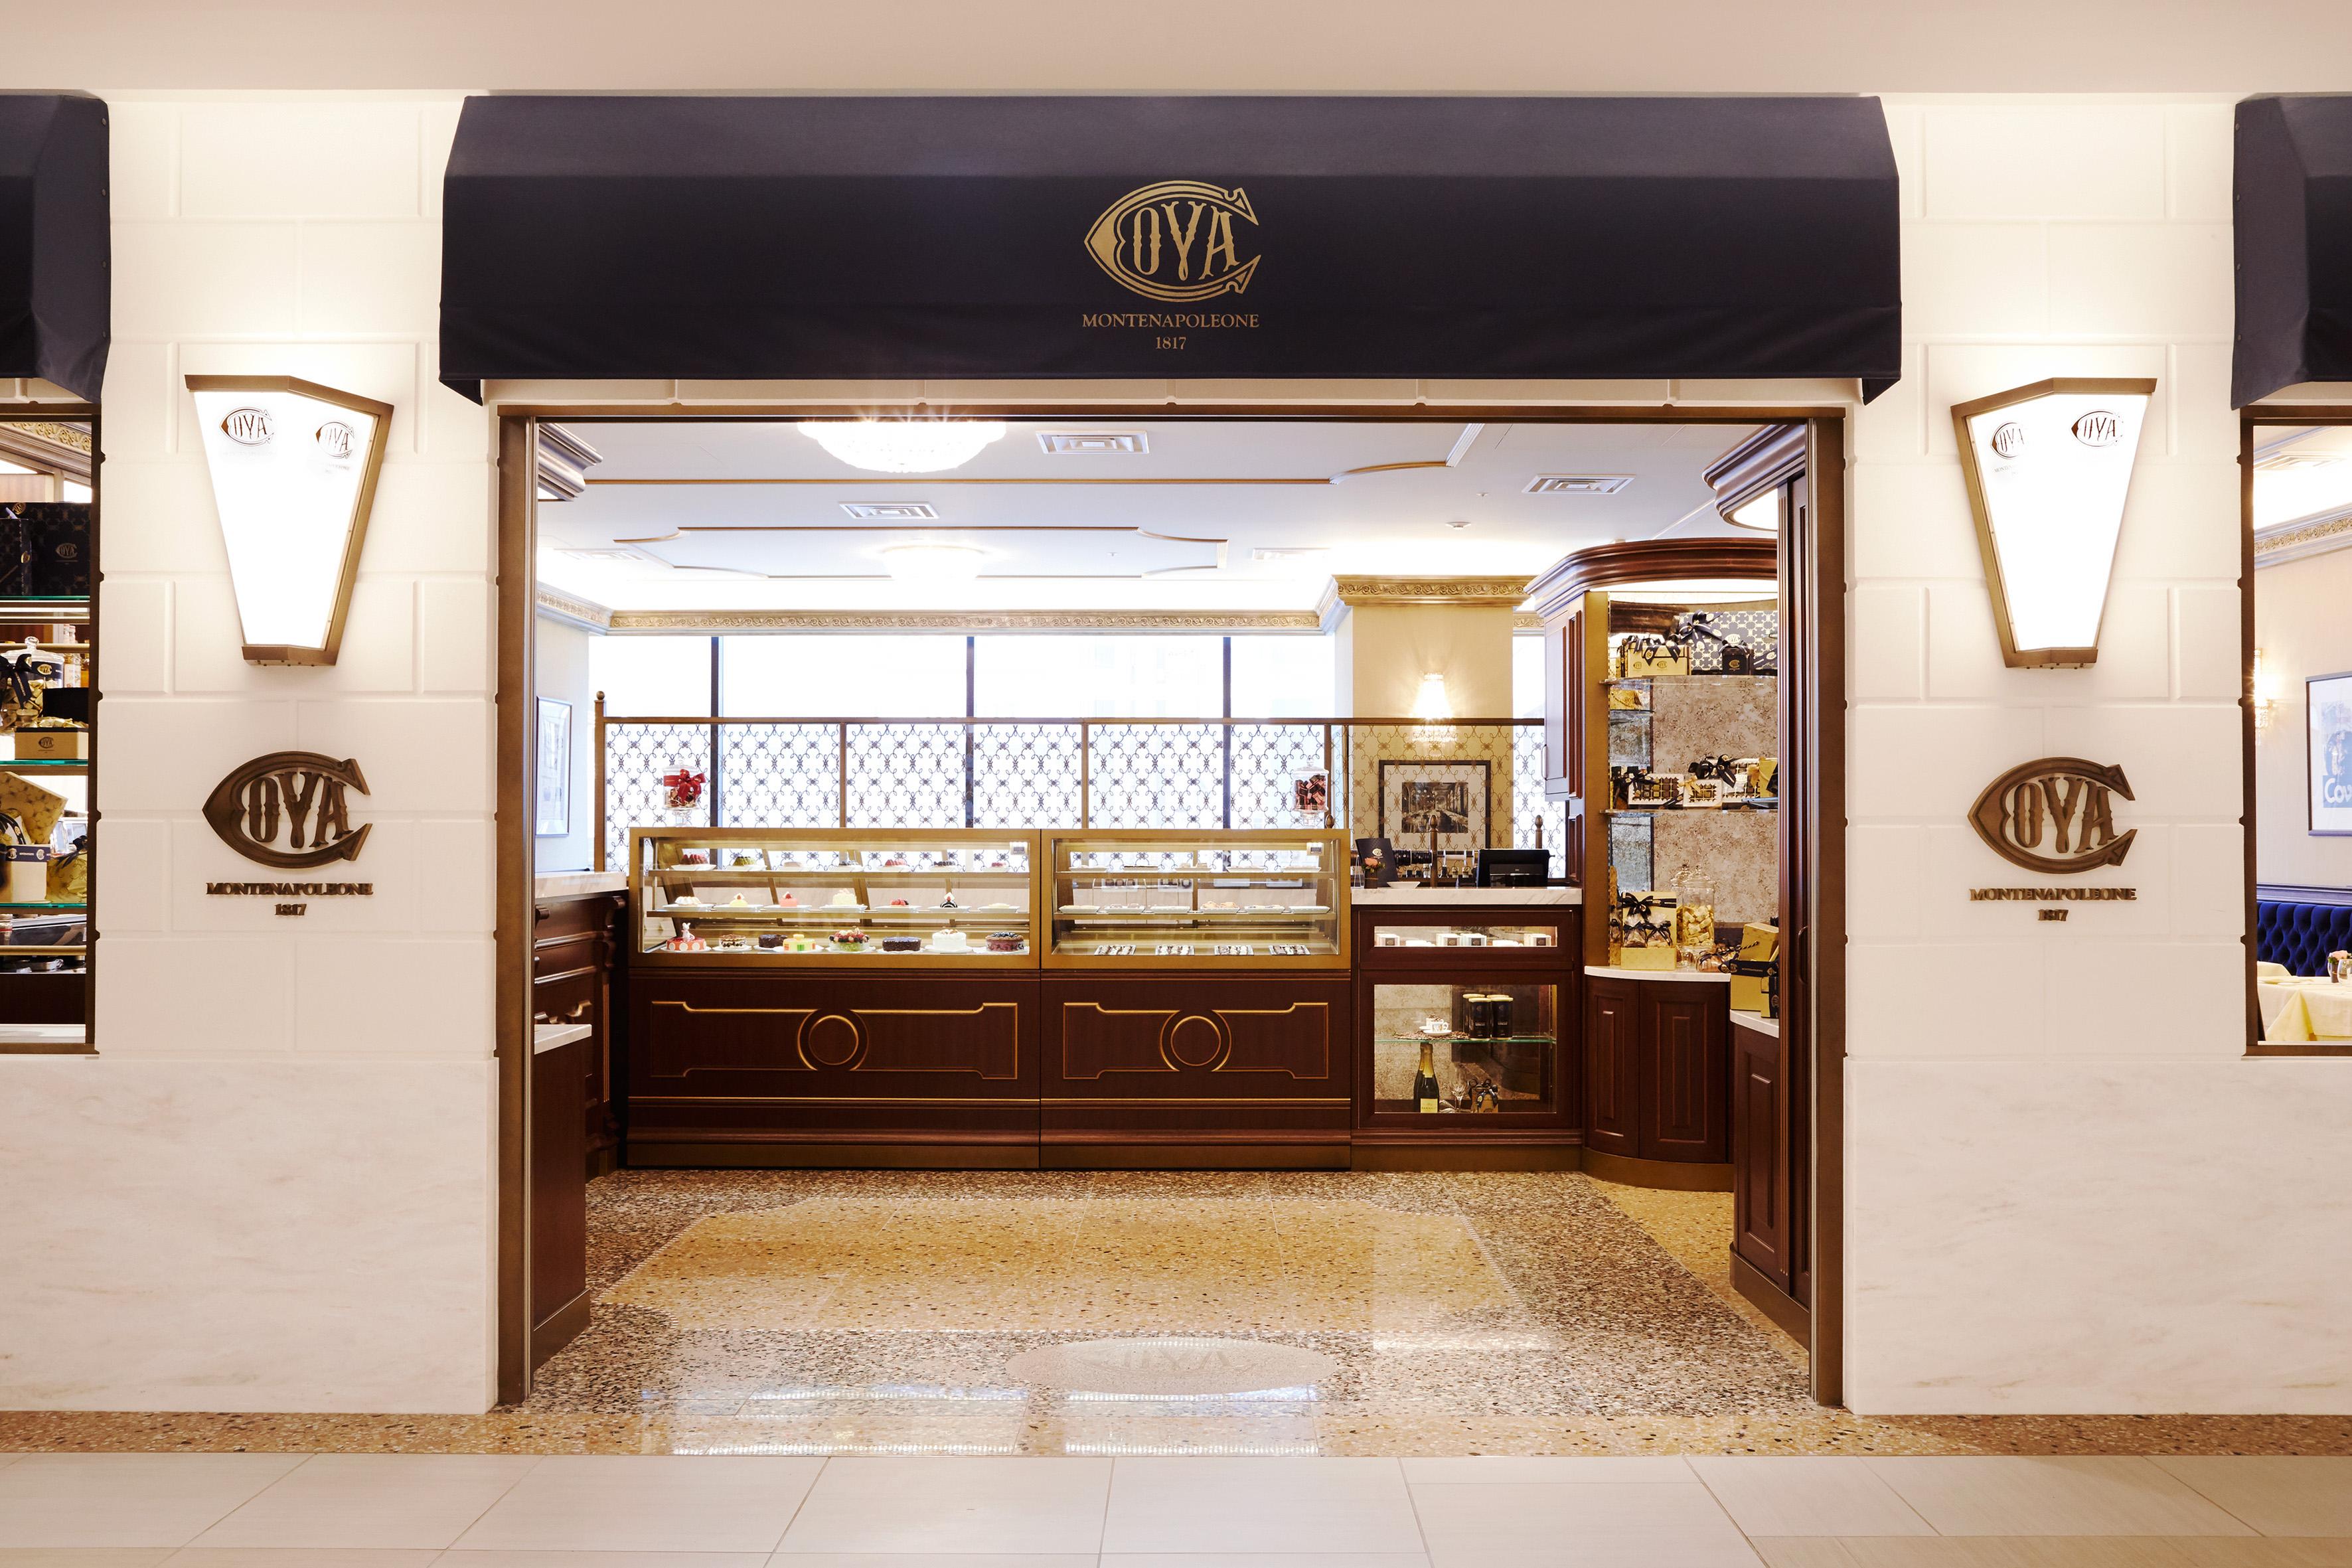 The Cova store in Tokyo.